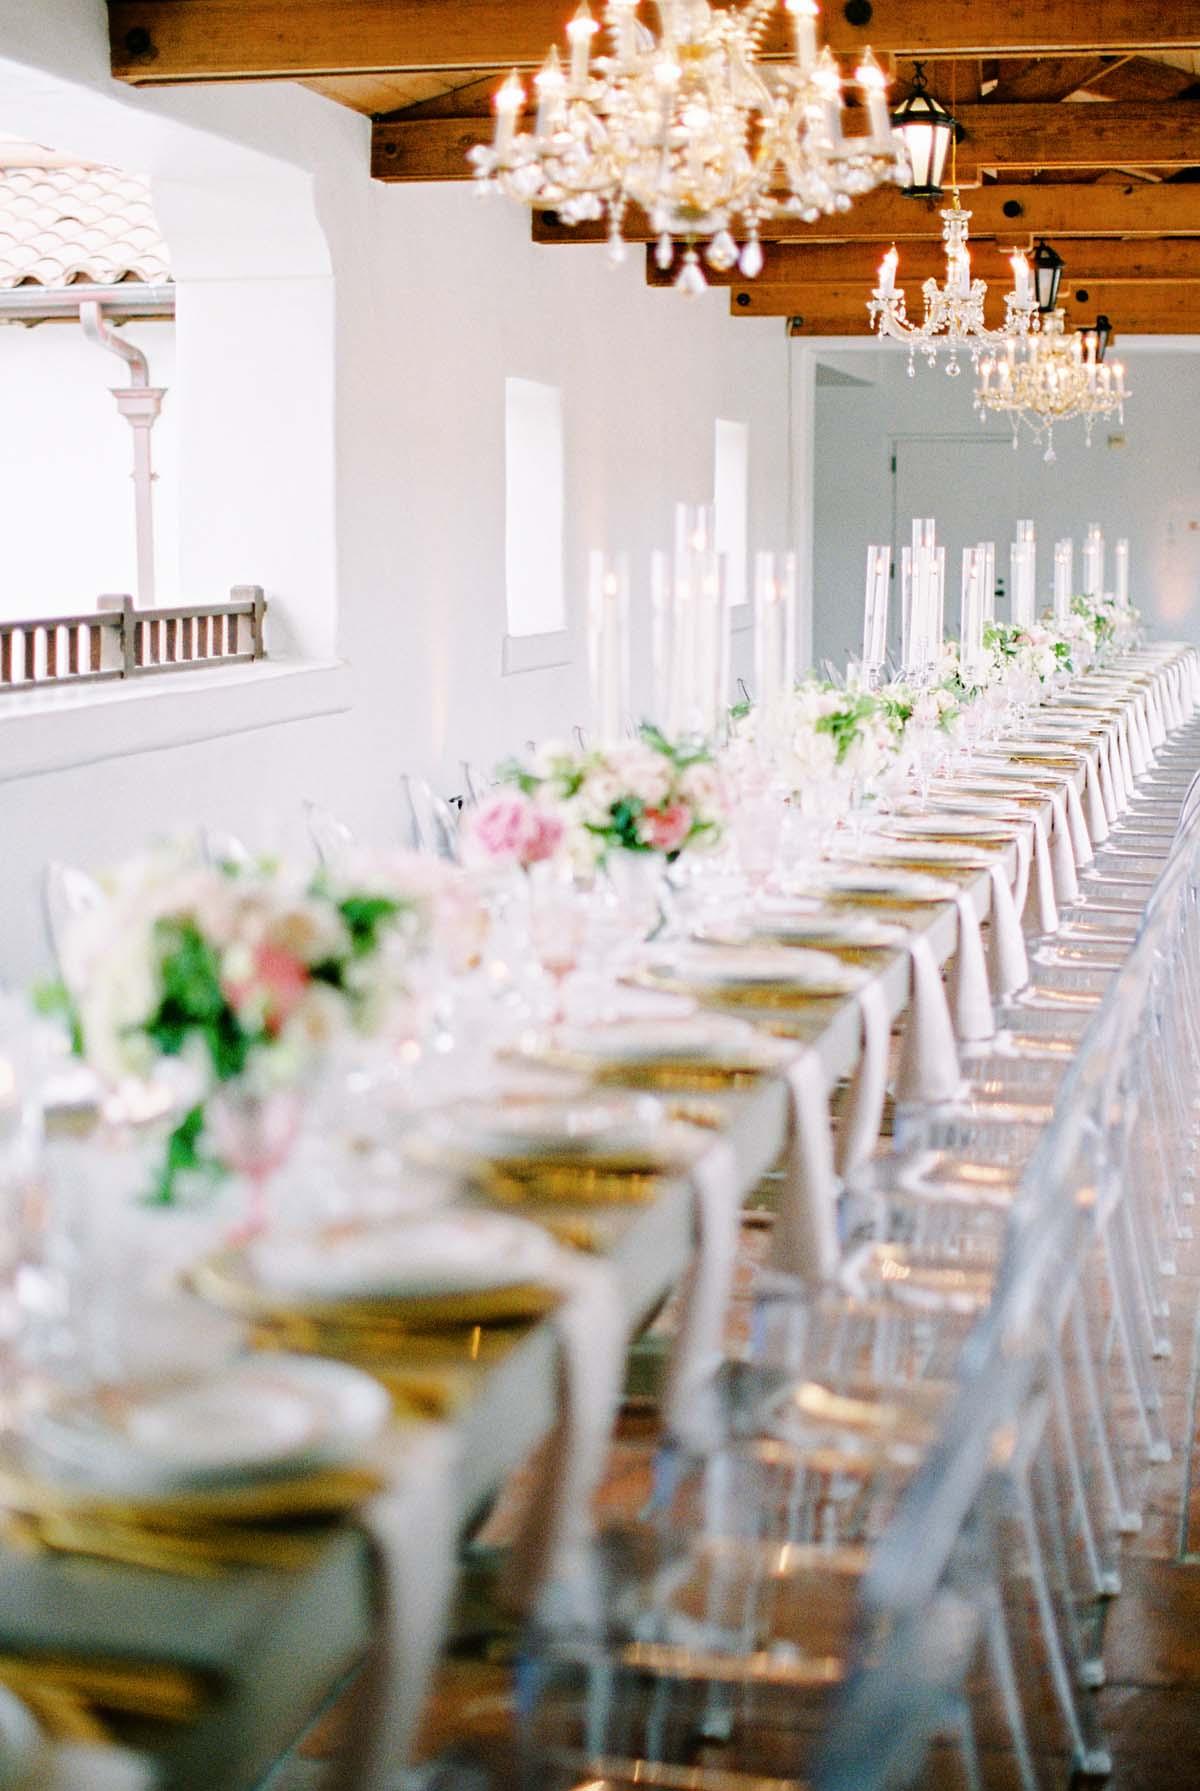 XOXO-BRIDE-Events_Michael-Anna-Costa-Photography-0034